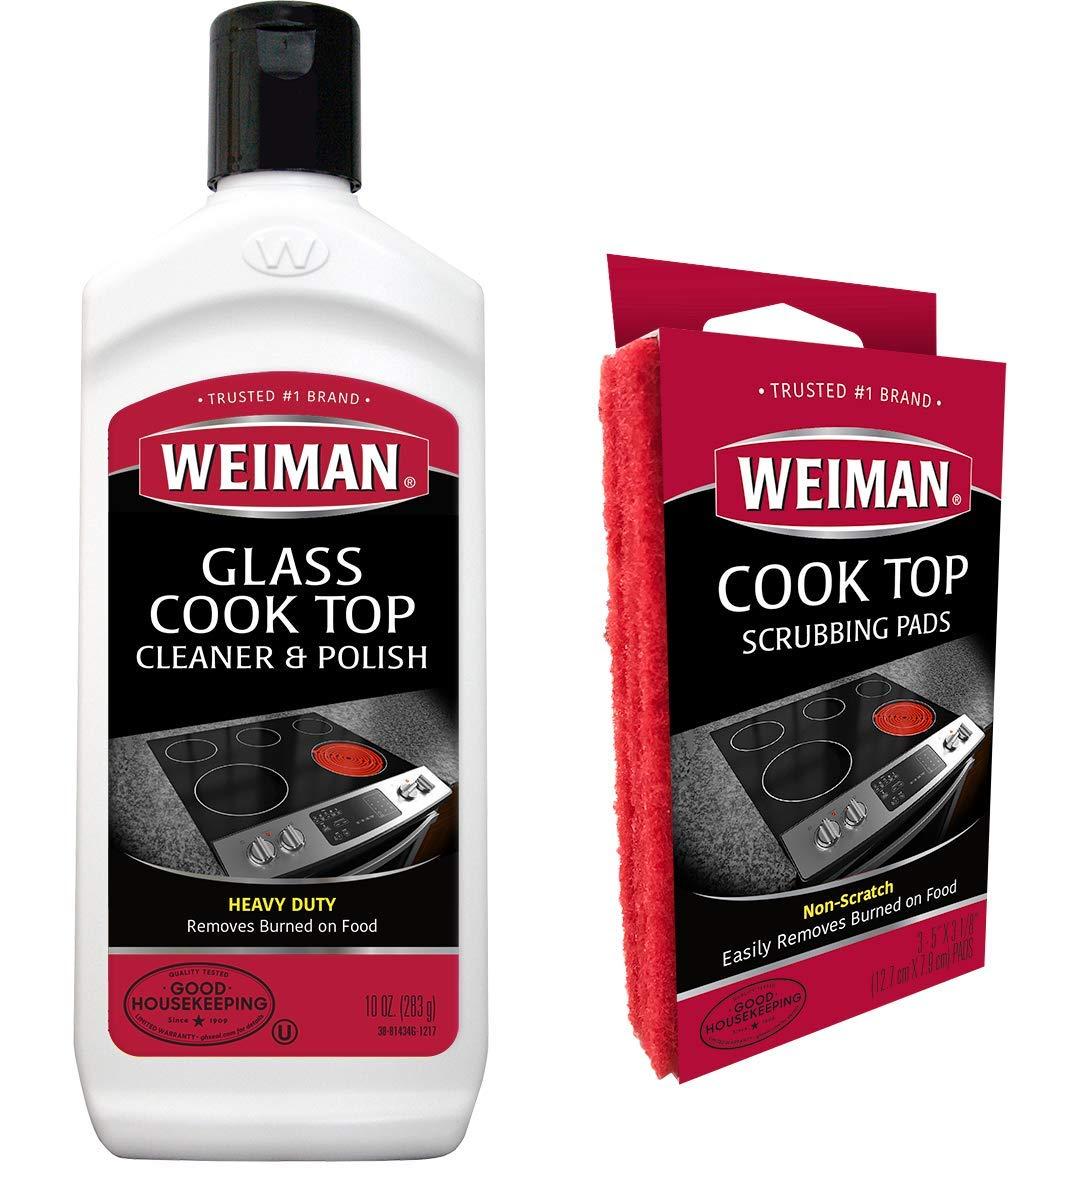 Weiman Ceramic Glass Cooktop Cleaner